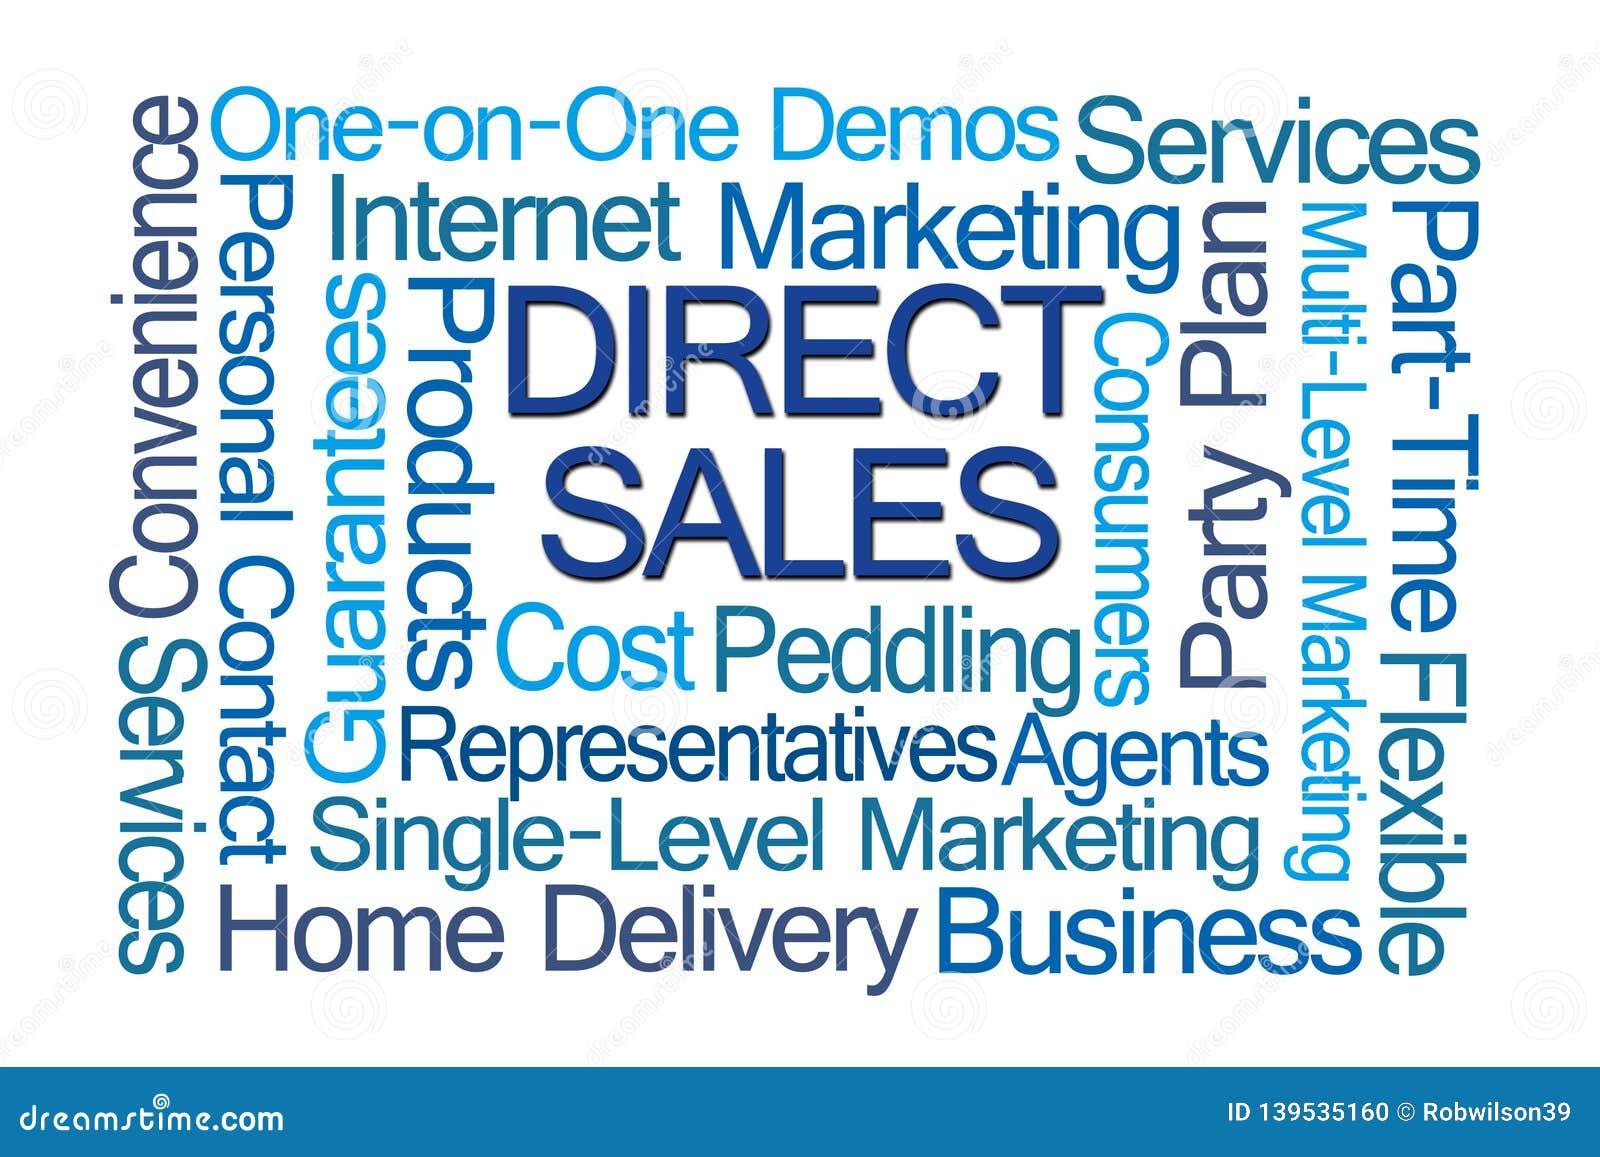 Direct Sales Word Cloud